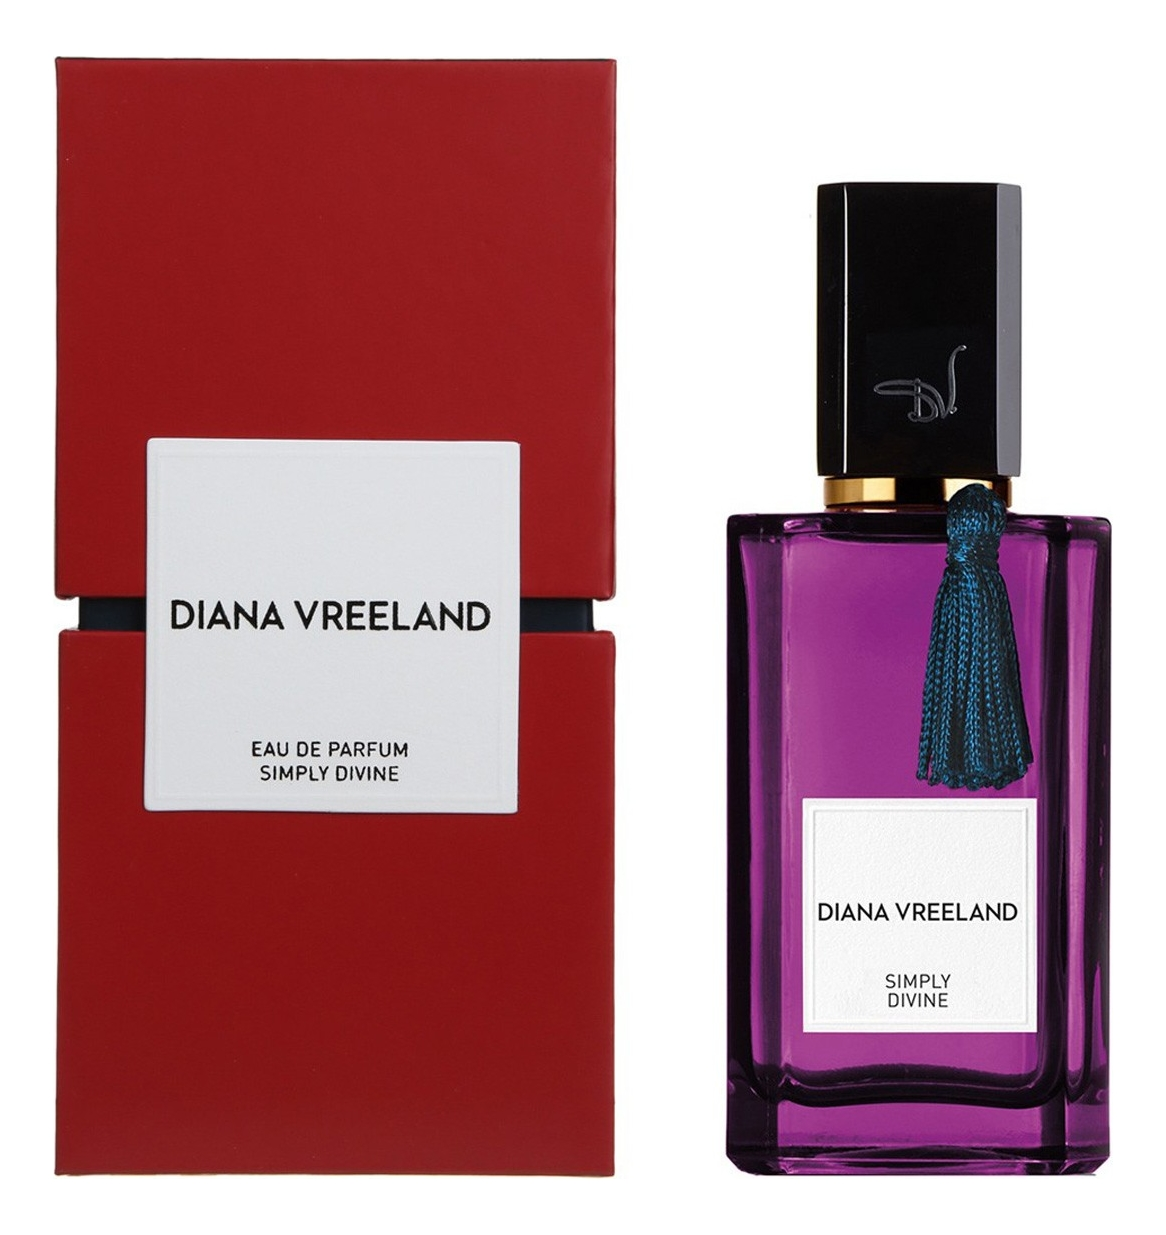 Diana Vreeland Simply Divine : парфюмерная вода 100мл diana vreeland simply divine туалетные духи 50 мл